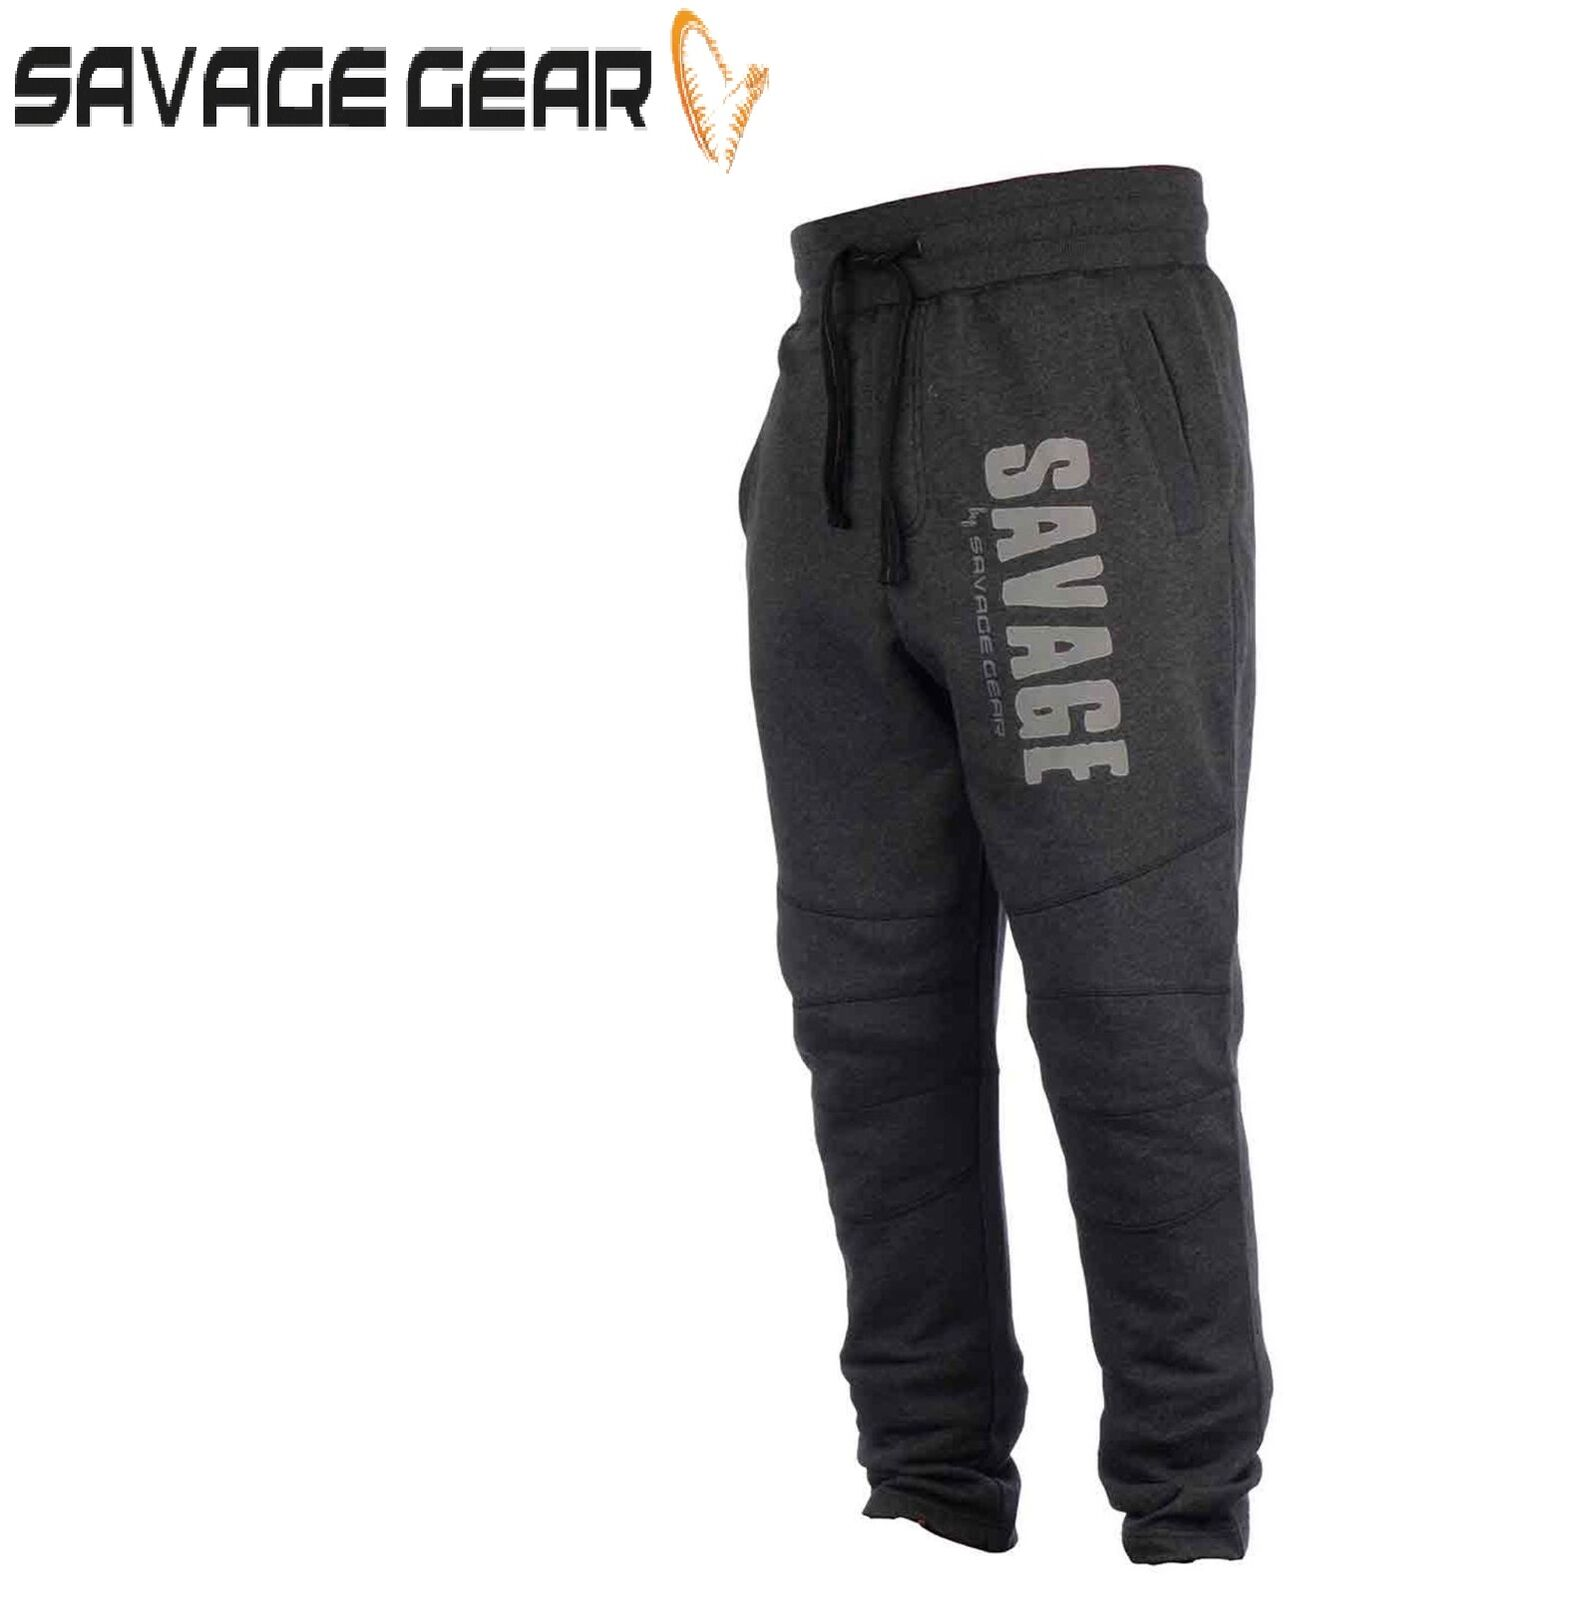 Savage Gear Simply Savage Joggers Trousers S - XXL XXL XXL f54a20